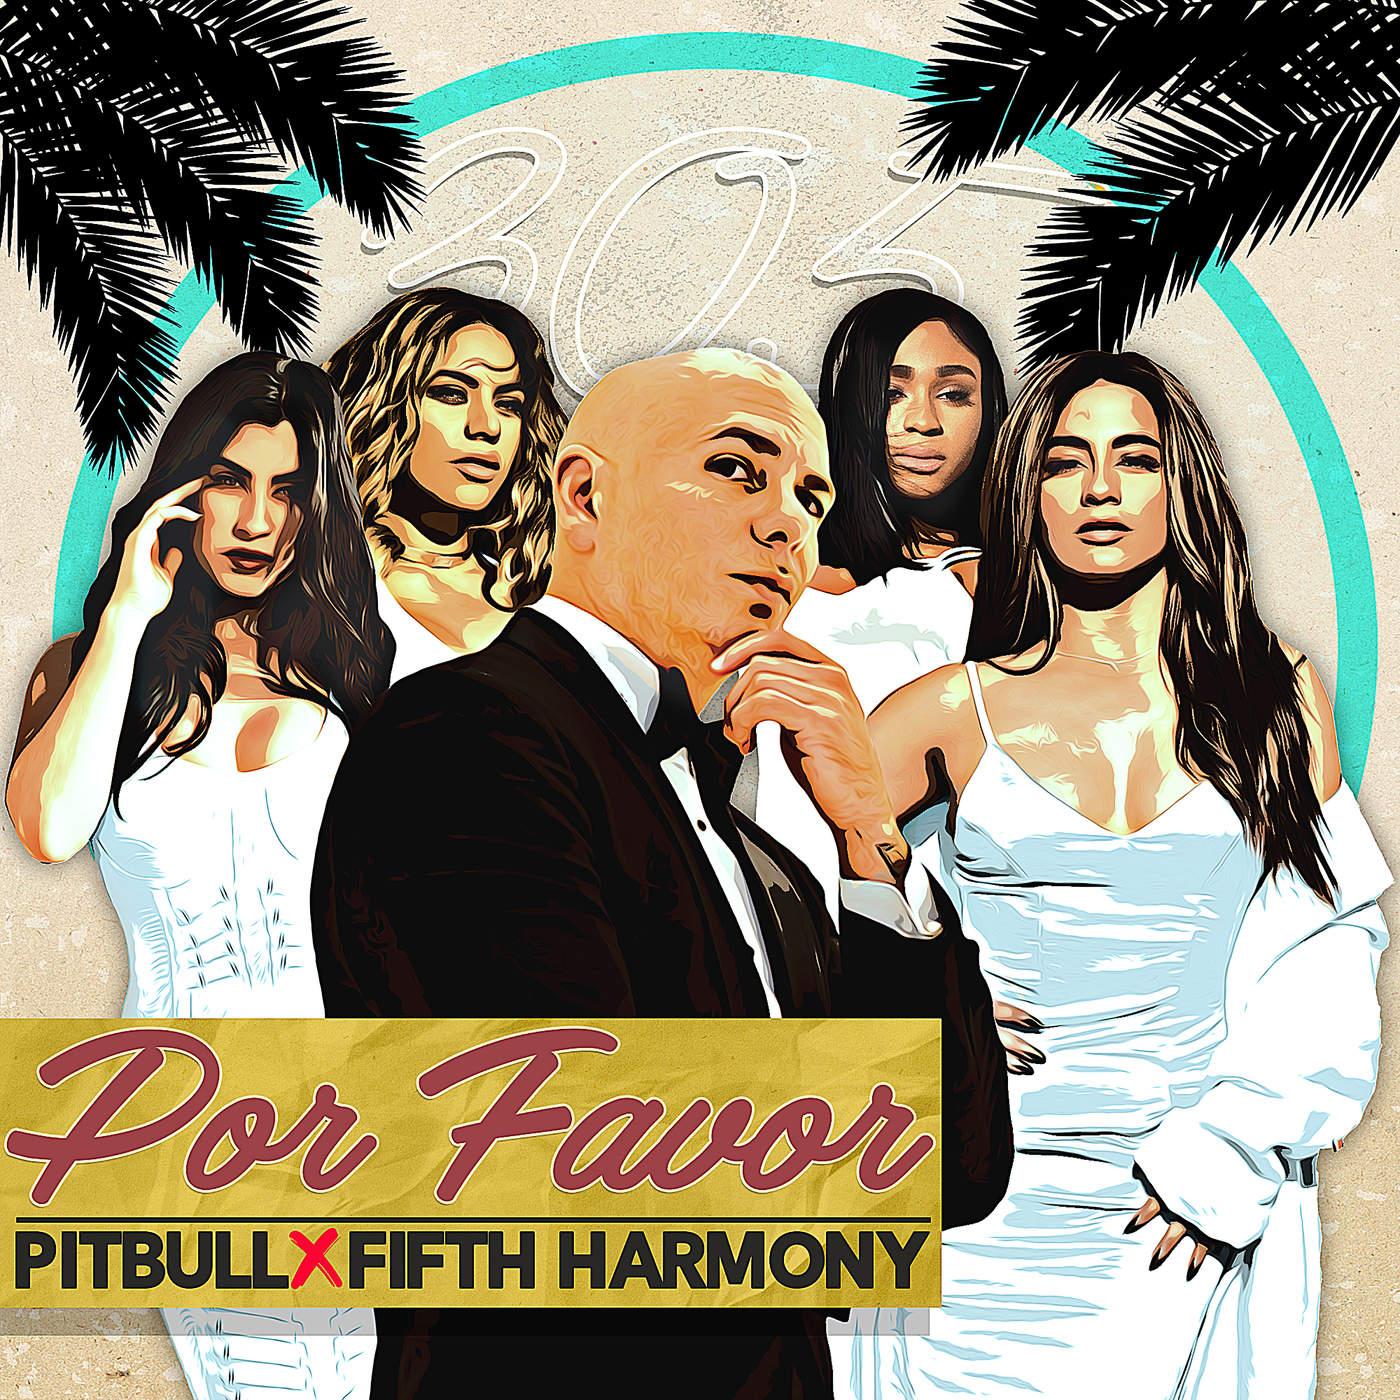 Pitbull & Fifth Harmony - Por Favor - Single